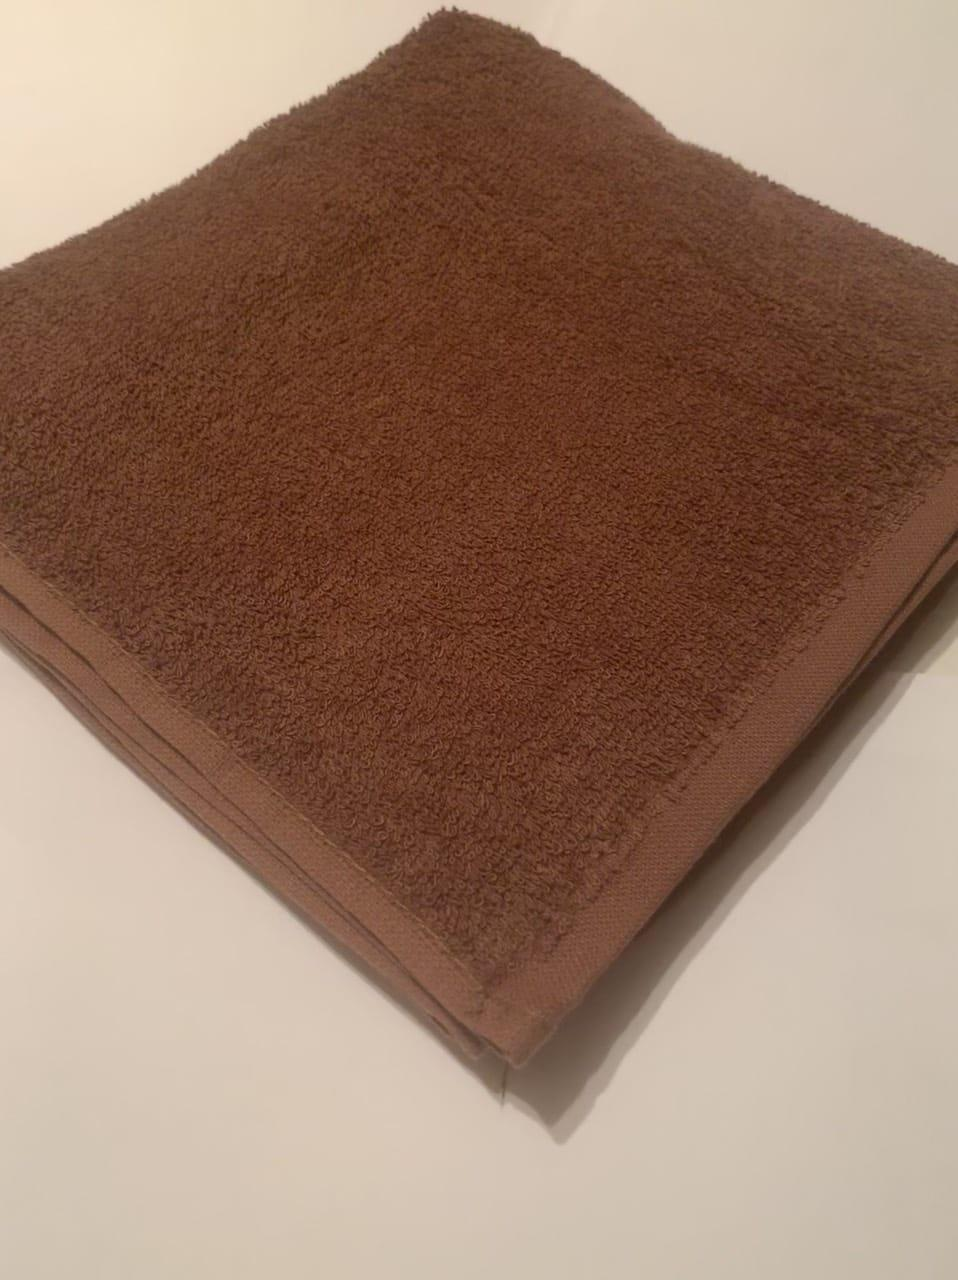 Полотенце махровое MainStays OBSIDIENNE коричневый 61*112